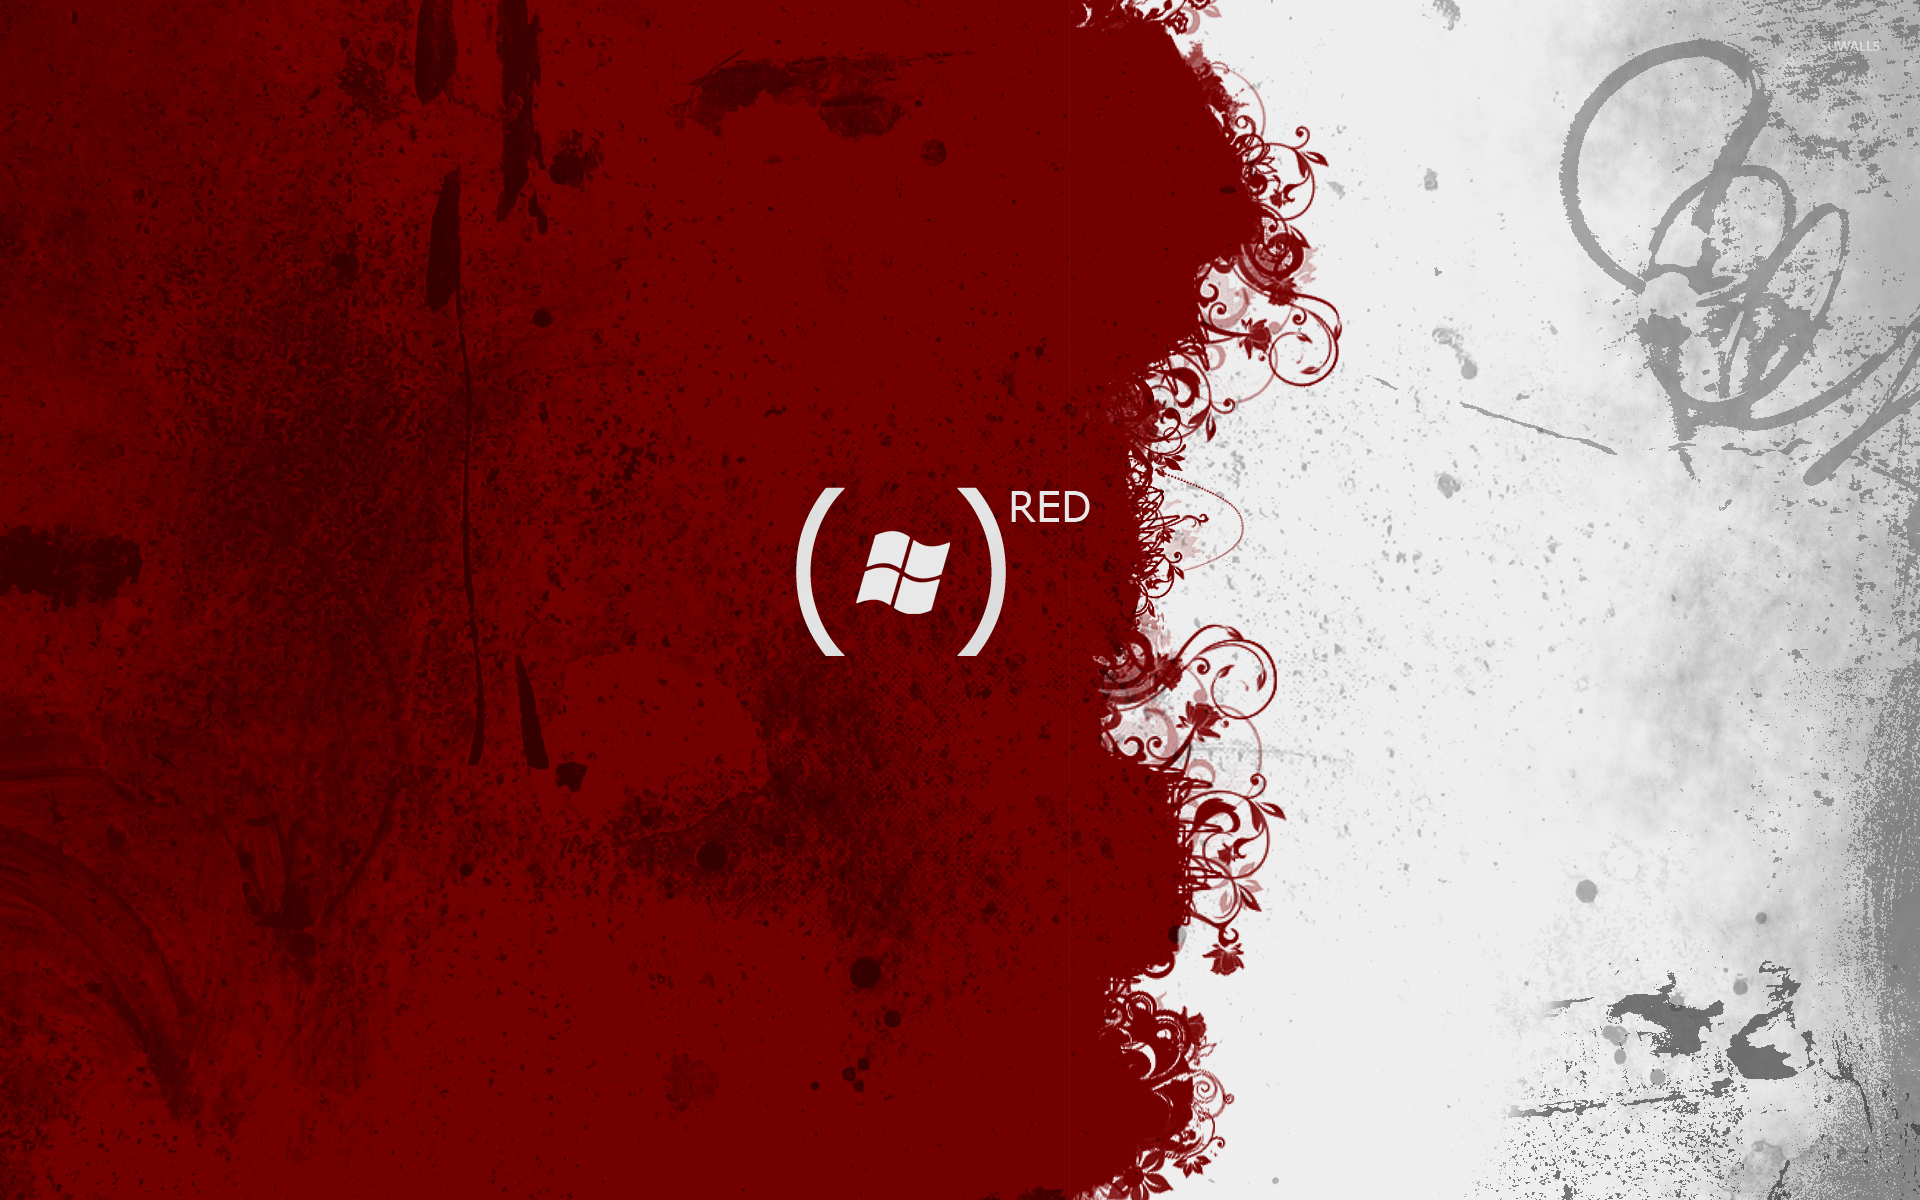 Windows 7 Red Wallpaper Computer Wallpapers 1460